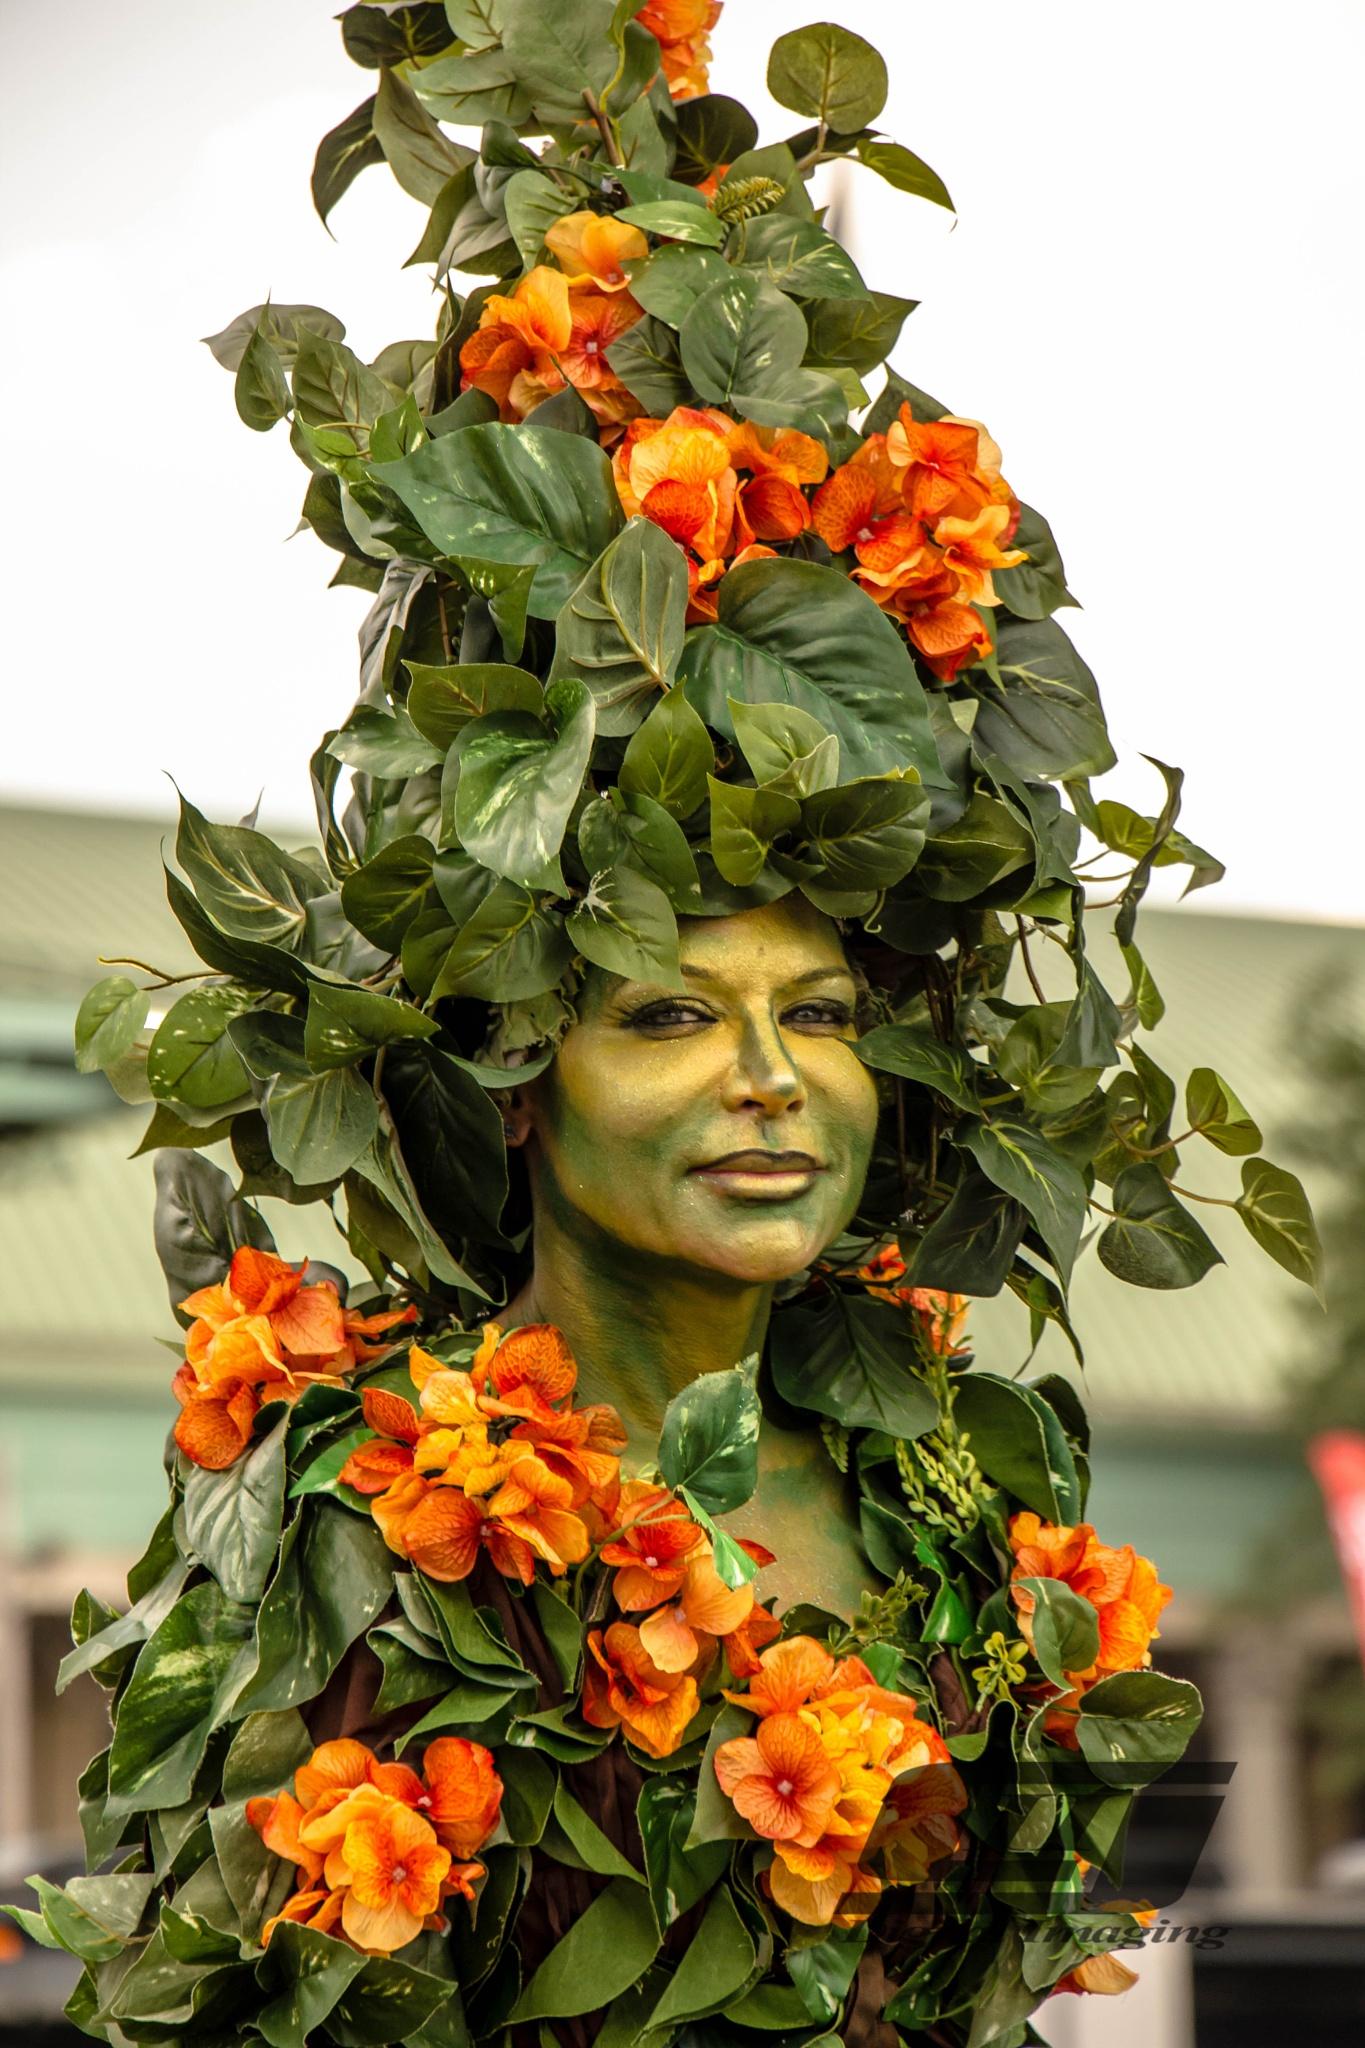 Plant woman by Charles Jorgensen